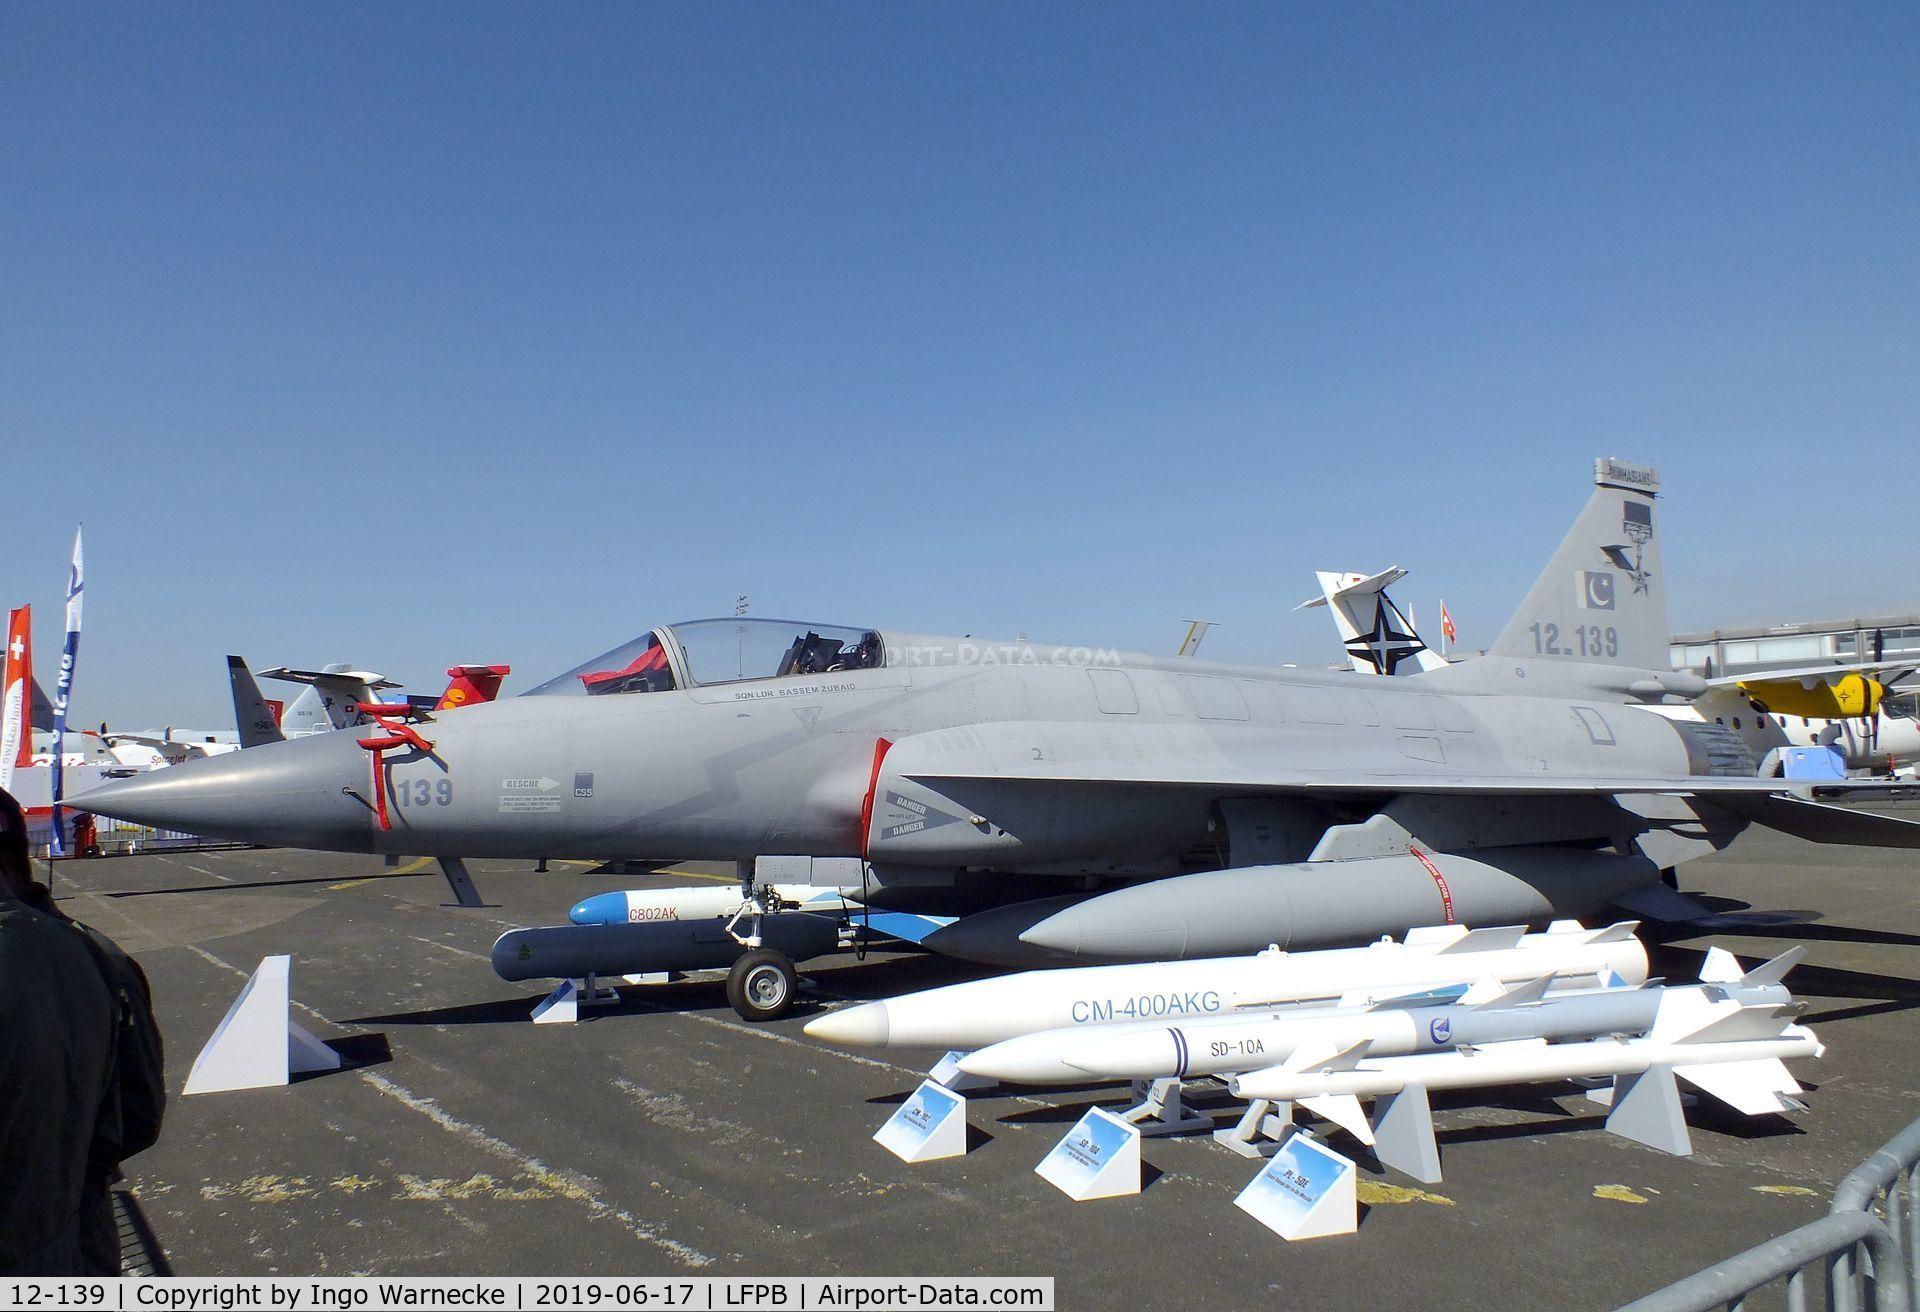 Aircraft 12-139 (PAC JF-17 Thunder C/N FC10131) Photo by